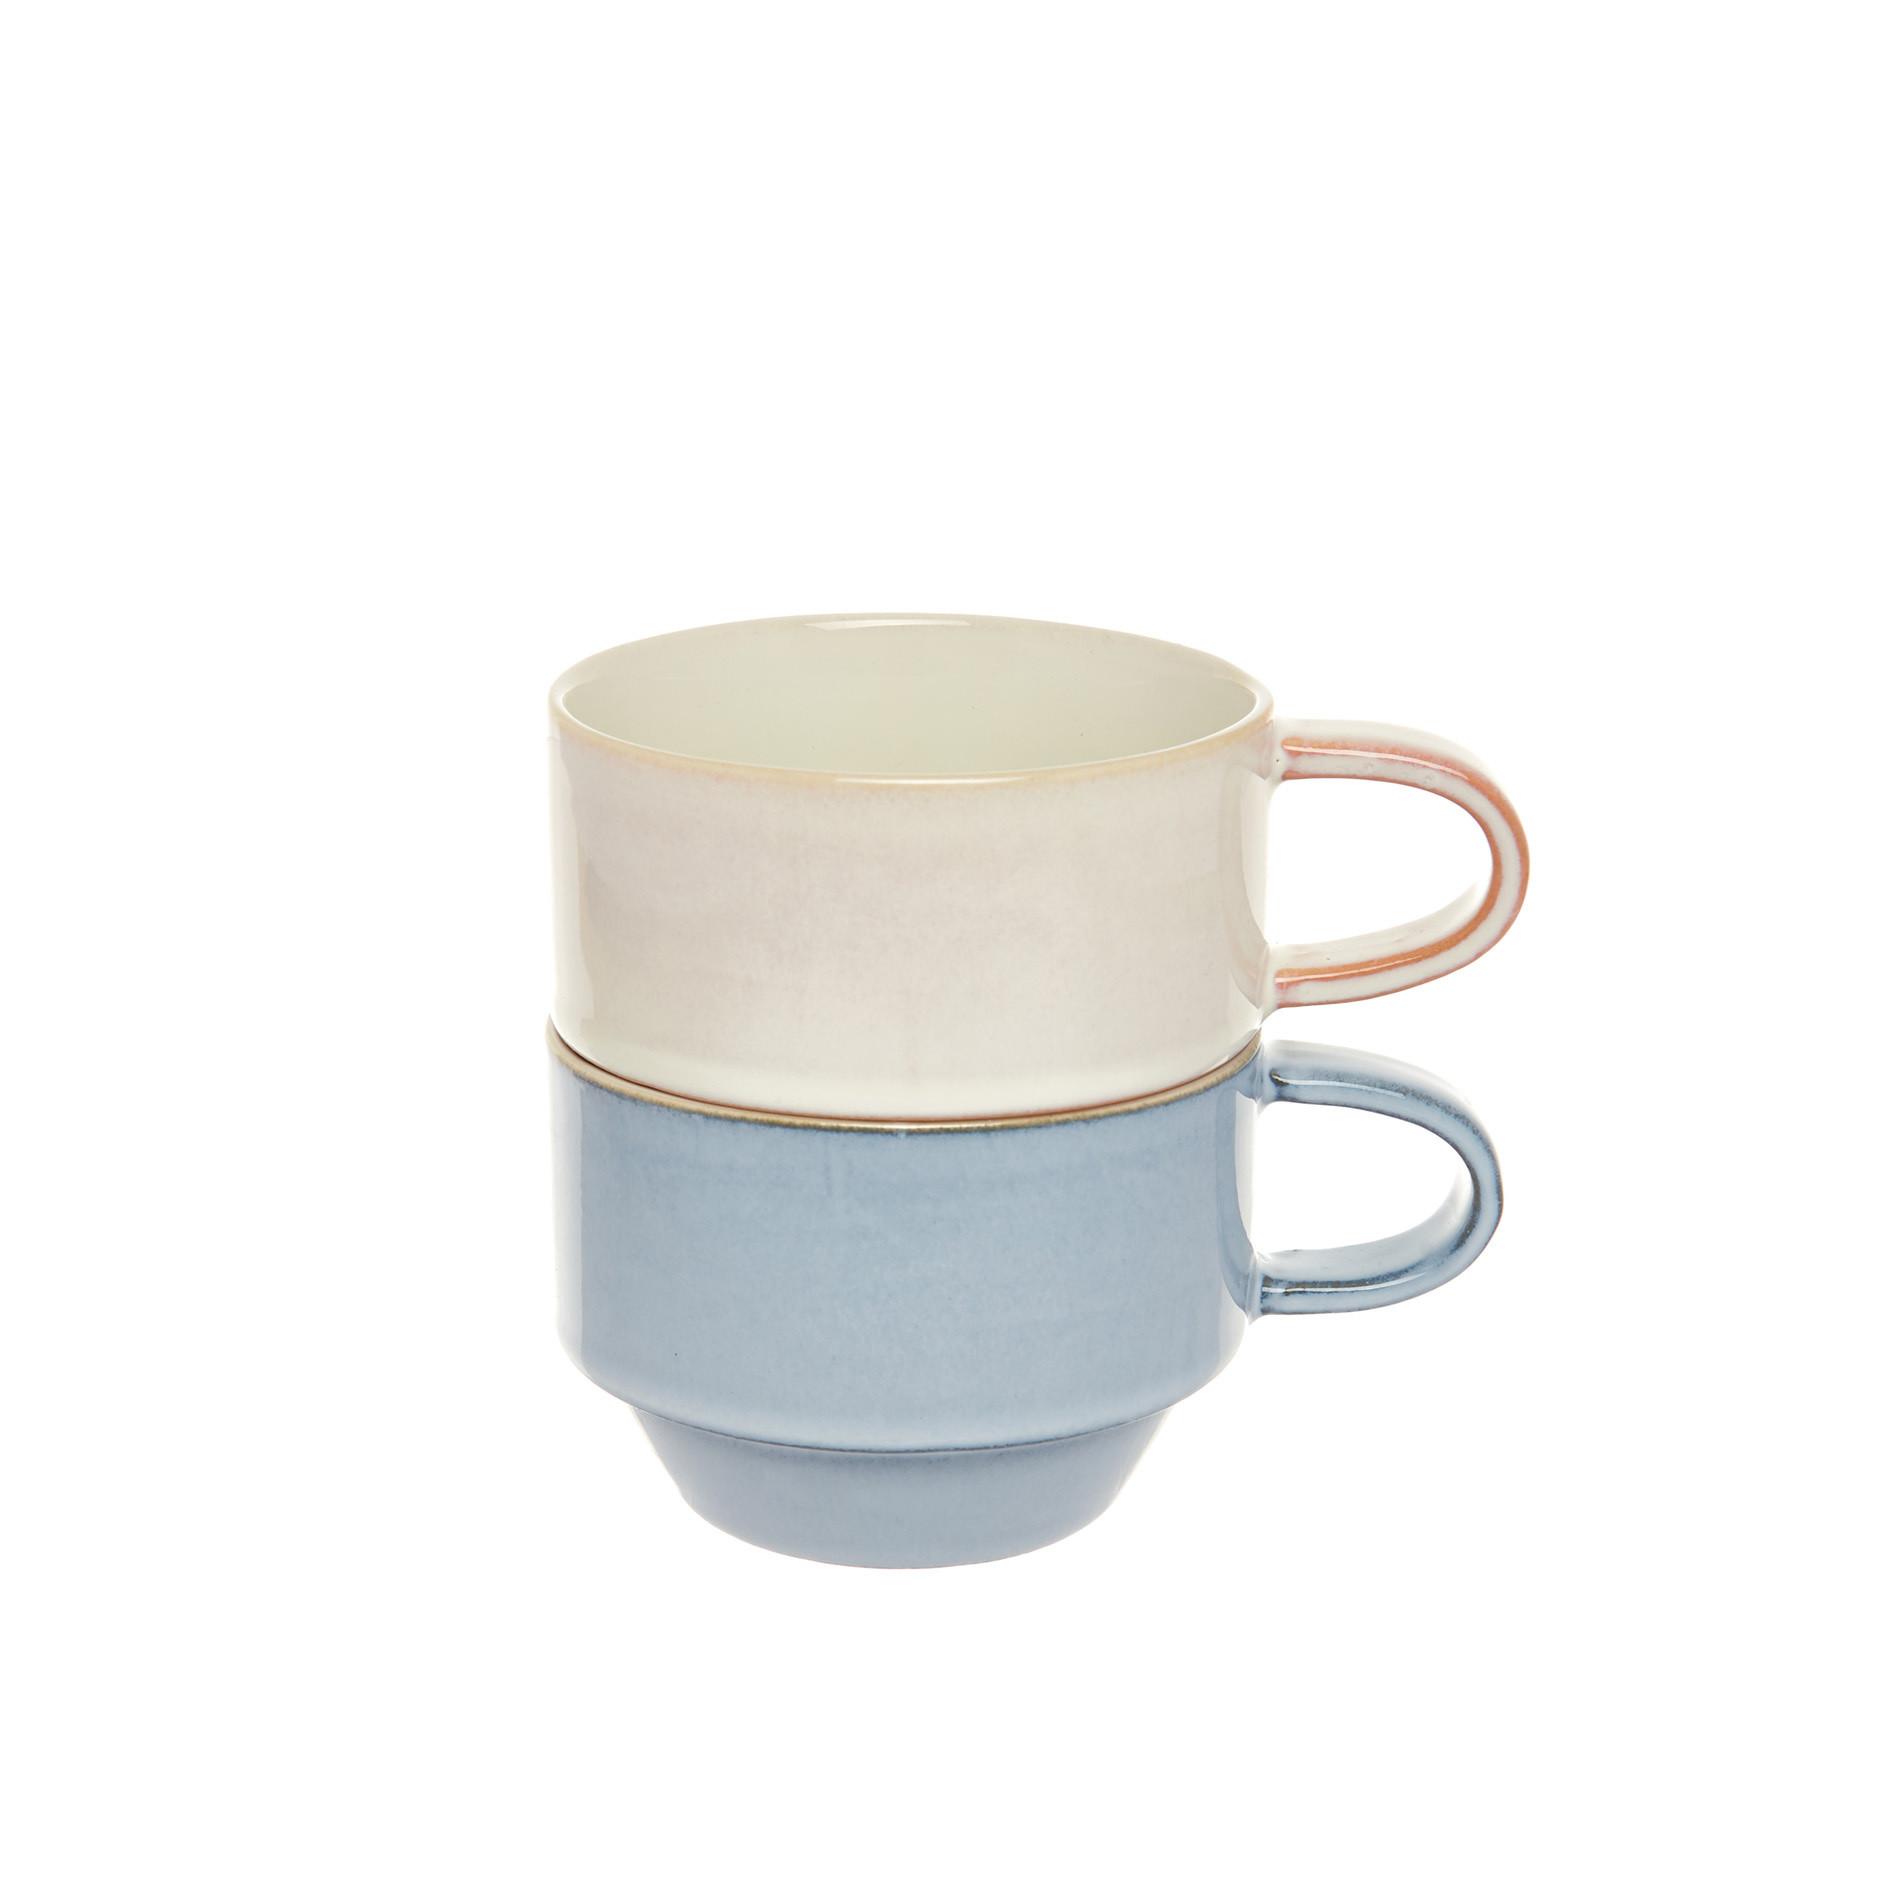 Tazze da tè stoneware colorate, Multicolor, large image number 0